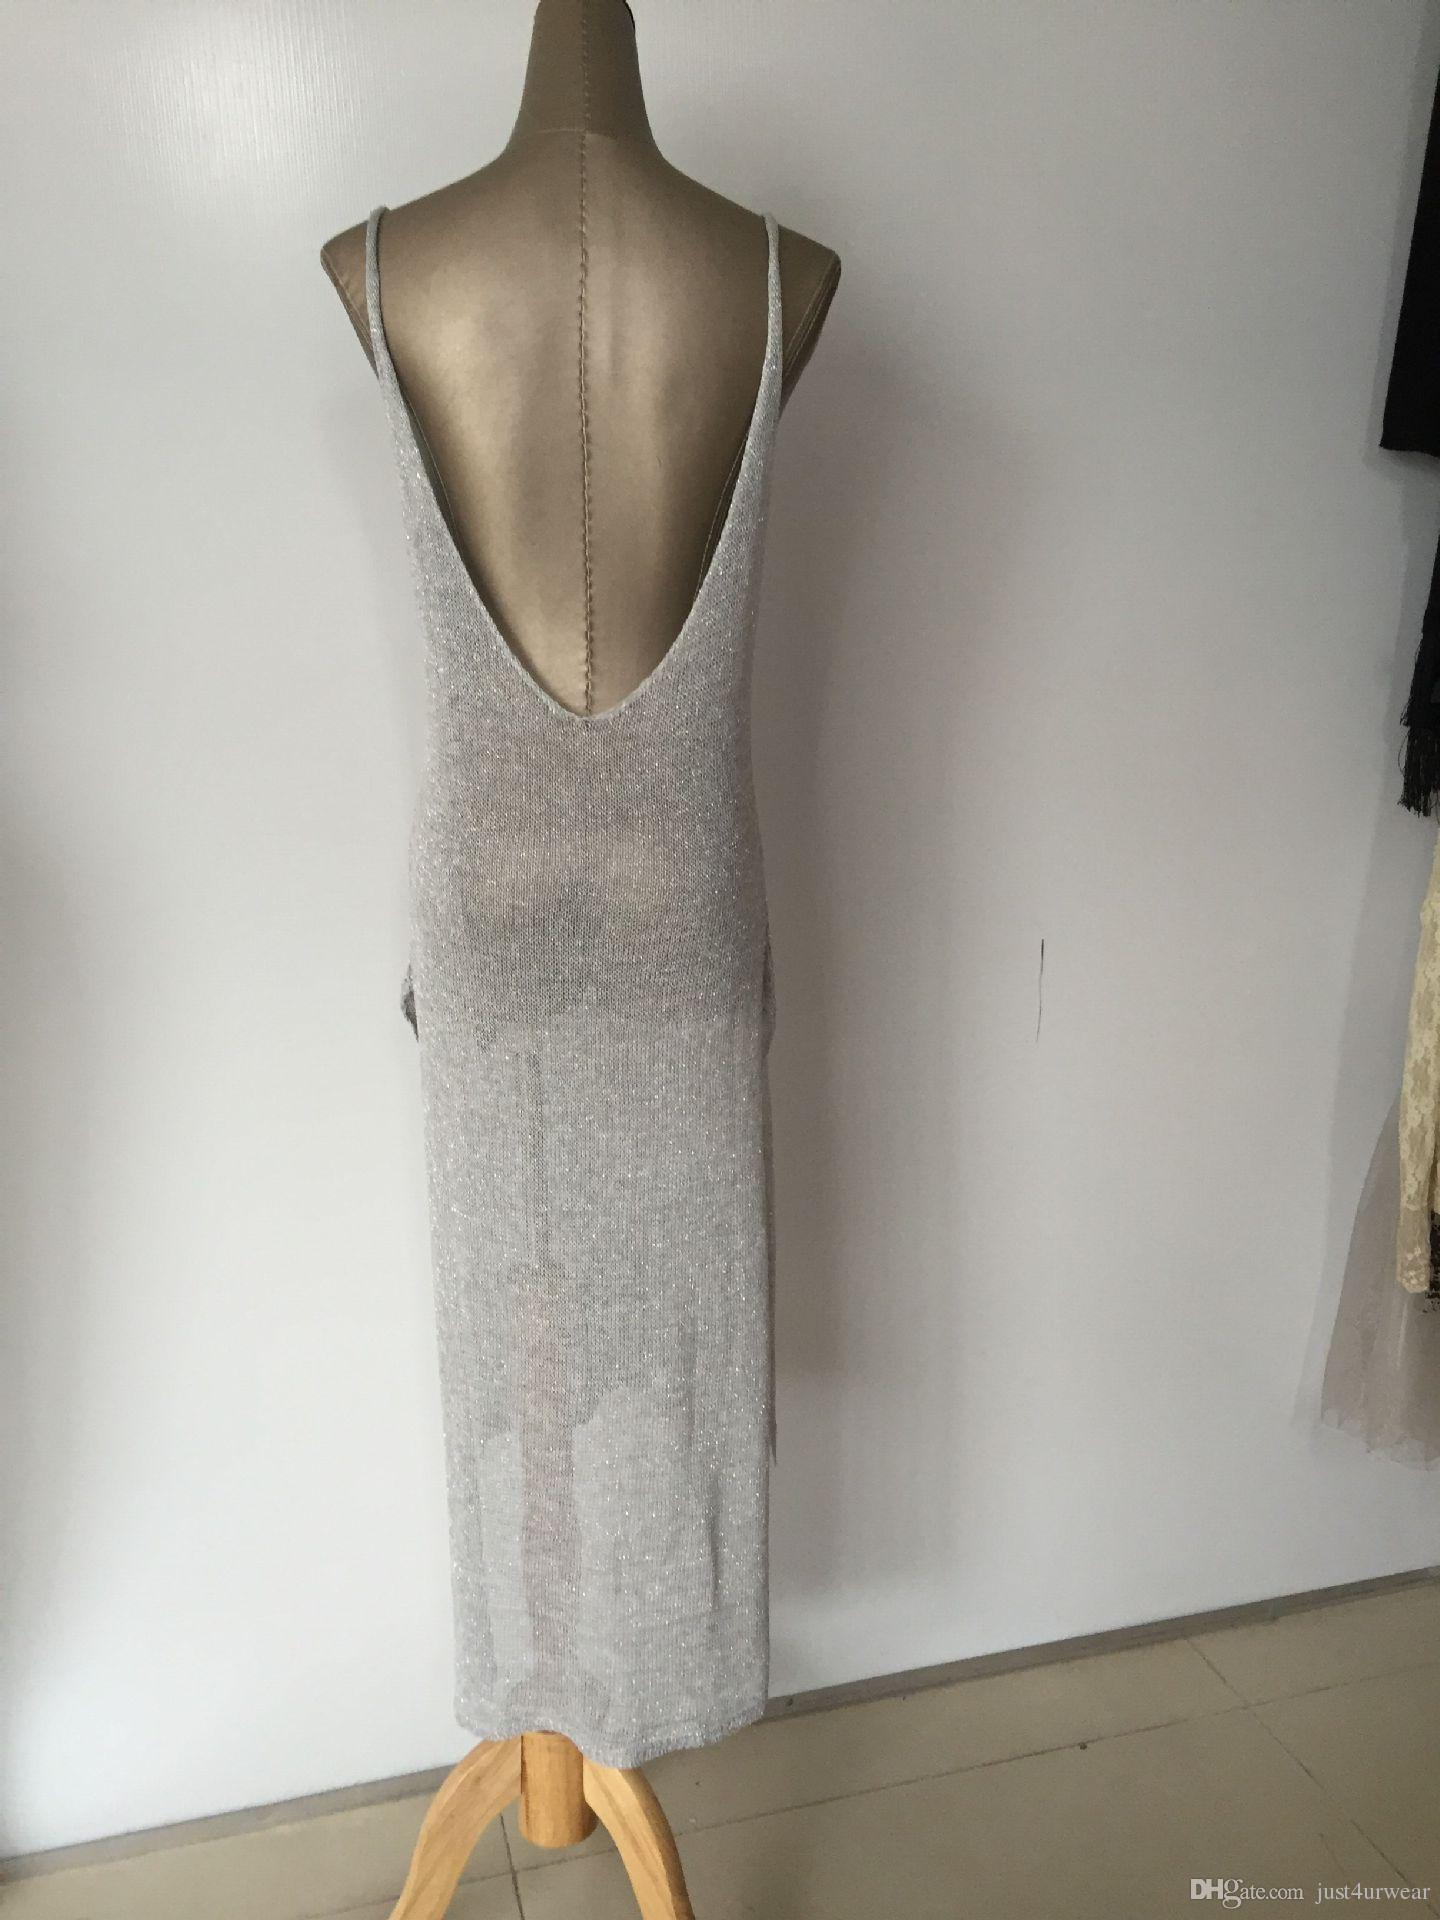 Damenbadwear Sexy Strand-Cover-ups aushöhlen Gestrickte Split-Tank-Top-lange Kleid-Deckel Körperhülle tragen Meer